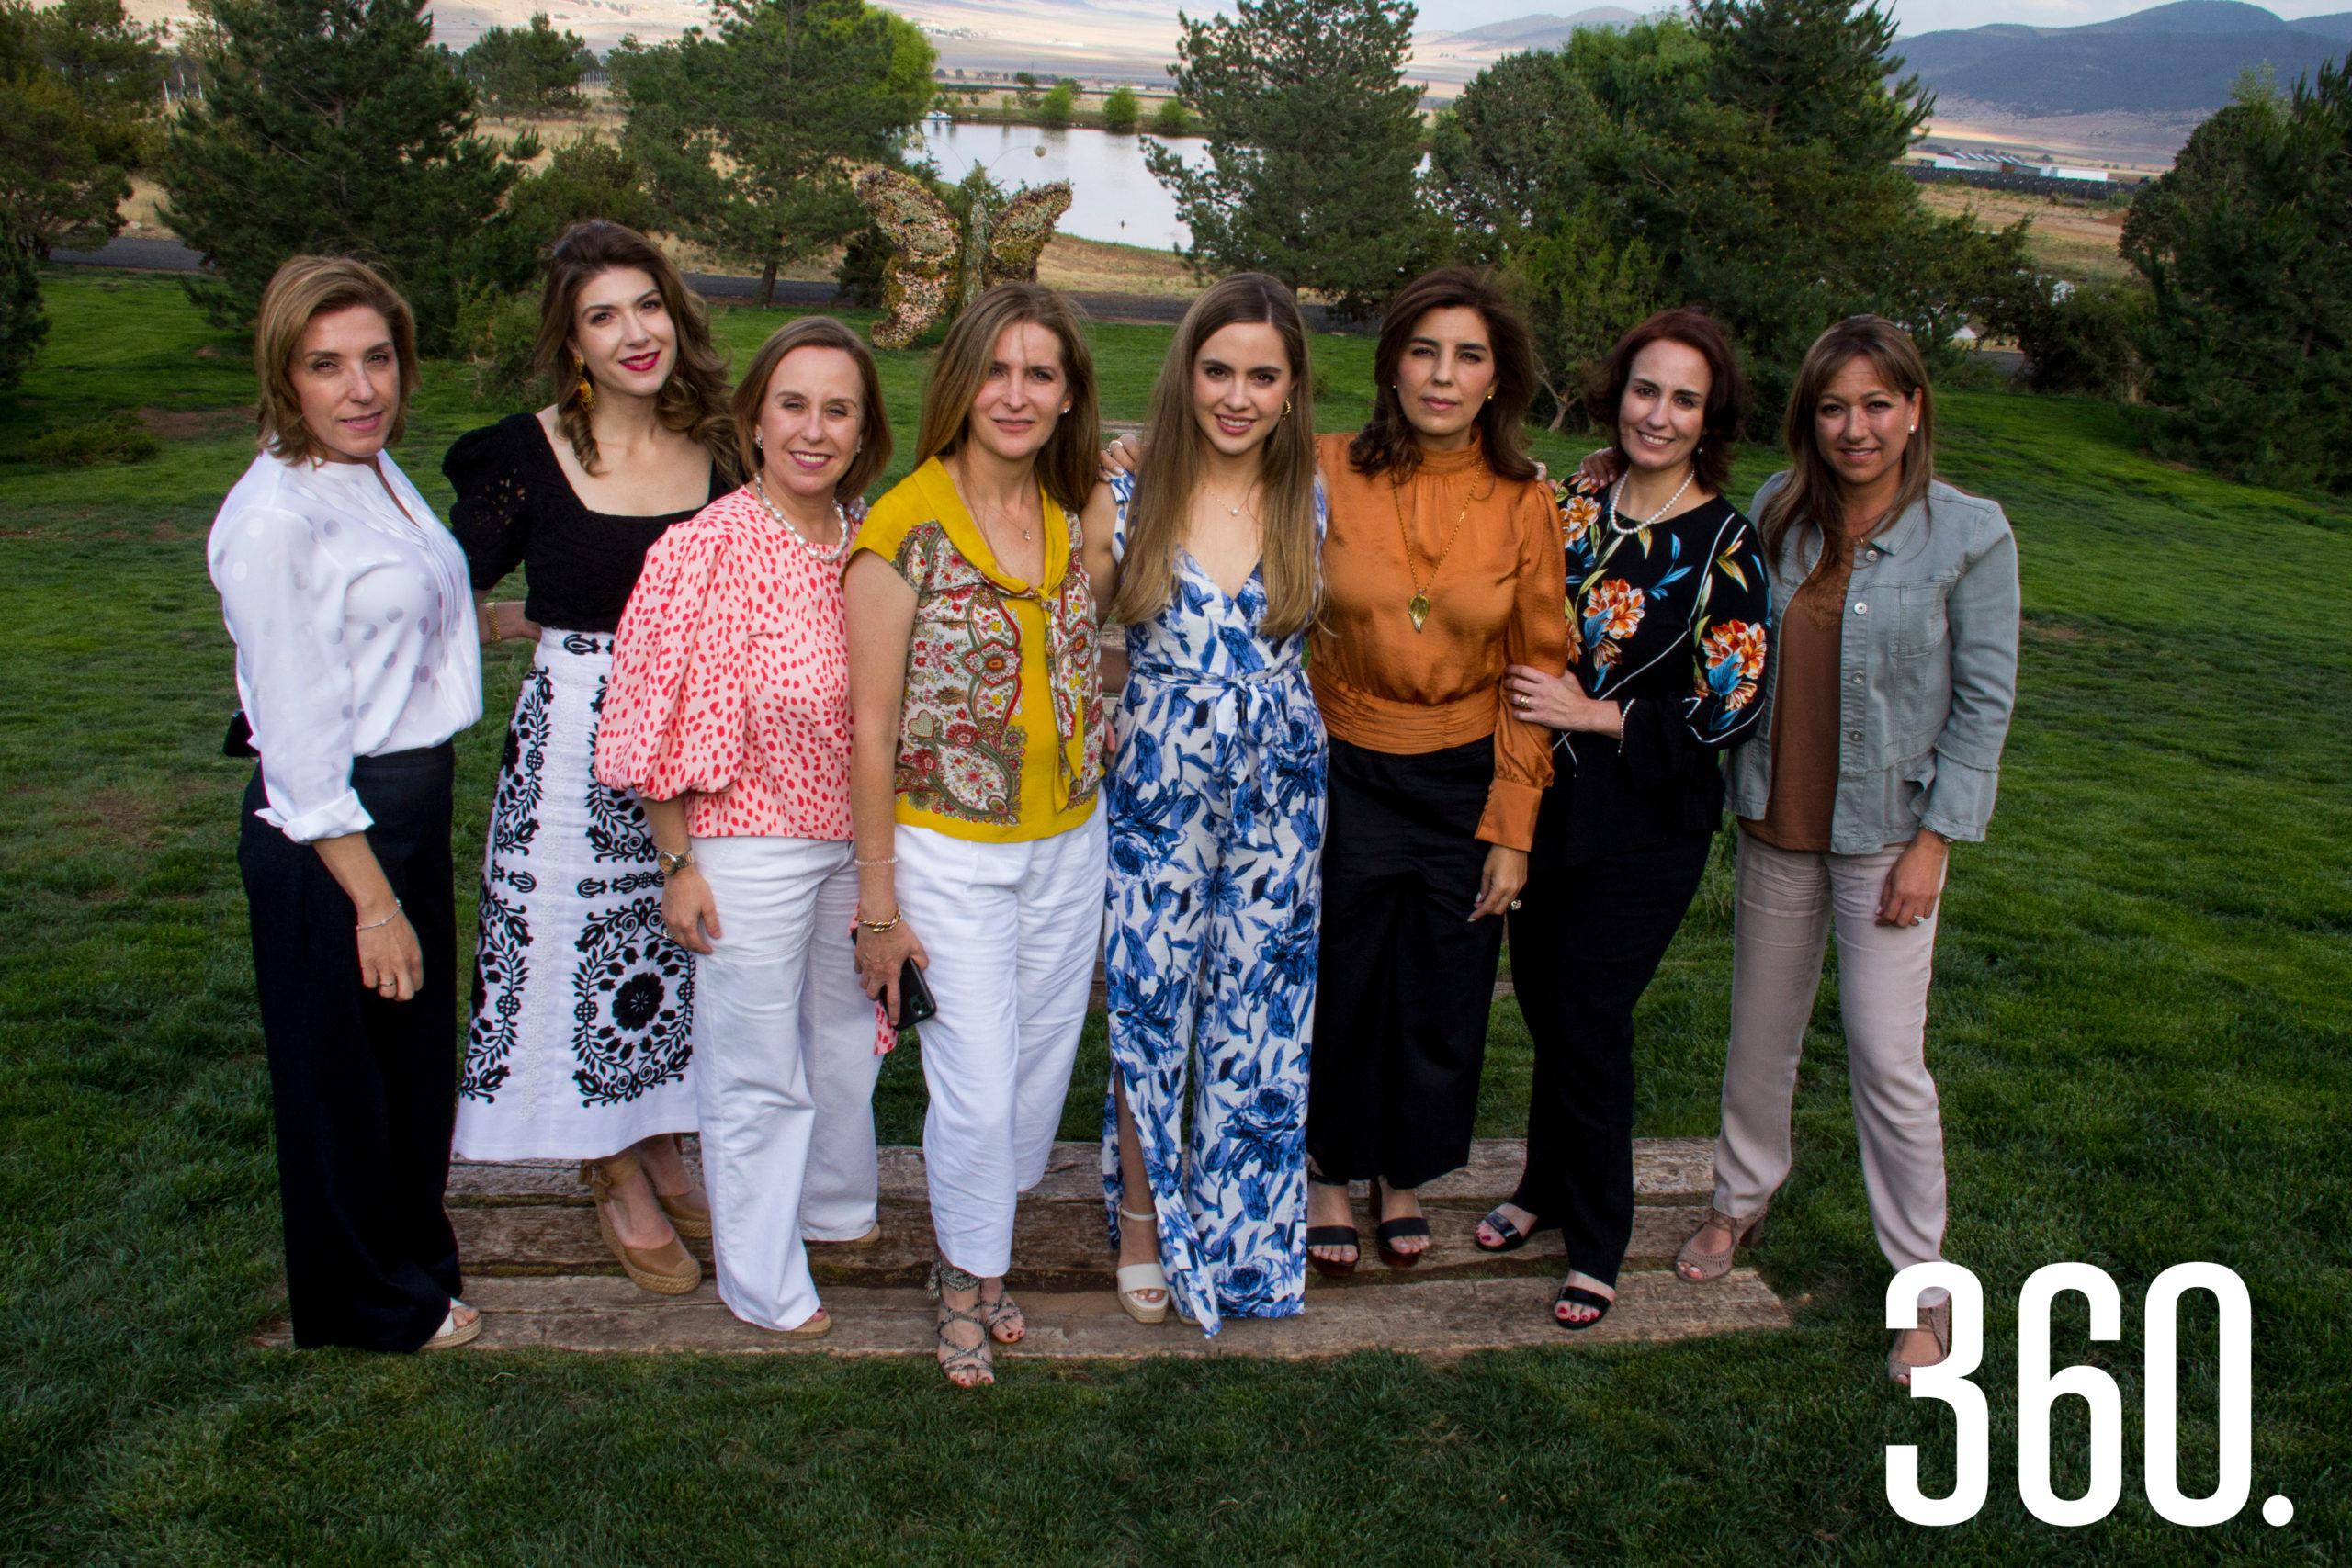 Malena Mendel, Verónica Abramo, Liana Dávila, Elma Arizpe, Daniela Arsuaga, Adriana Vargas, Adriana Valdés y Linda Berchelman.